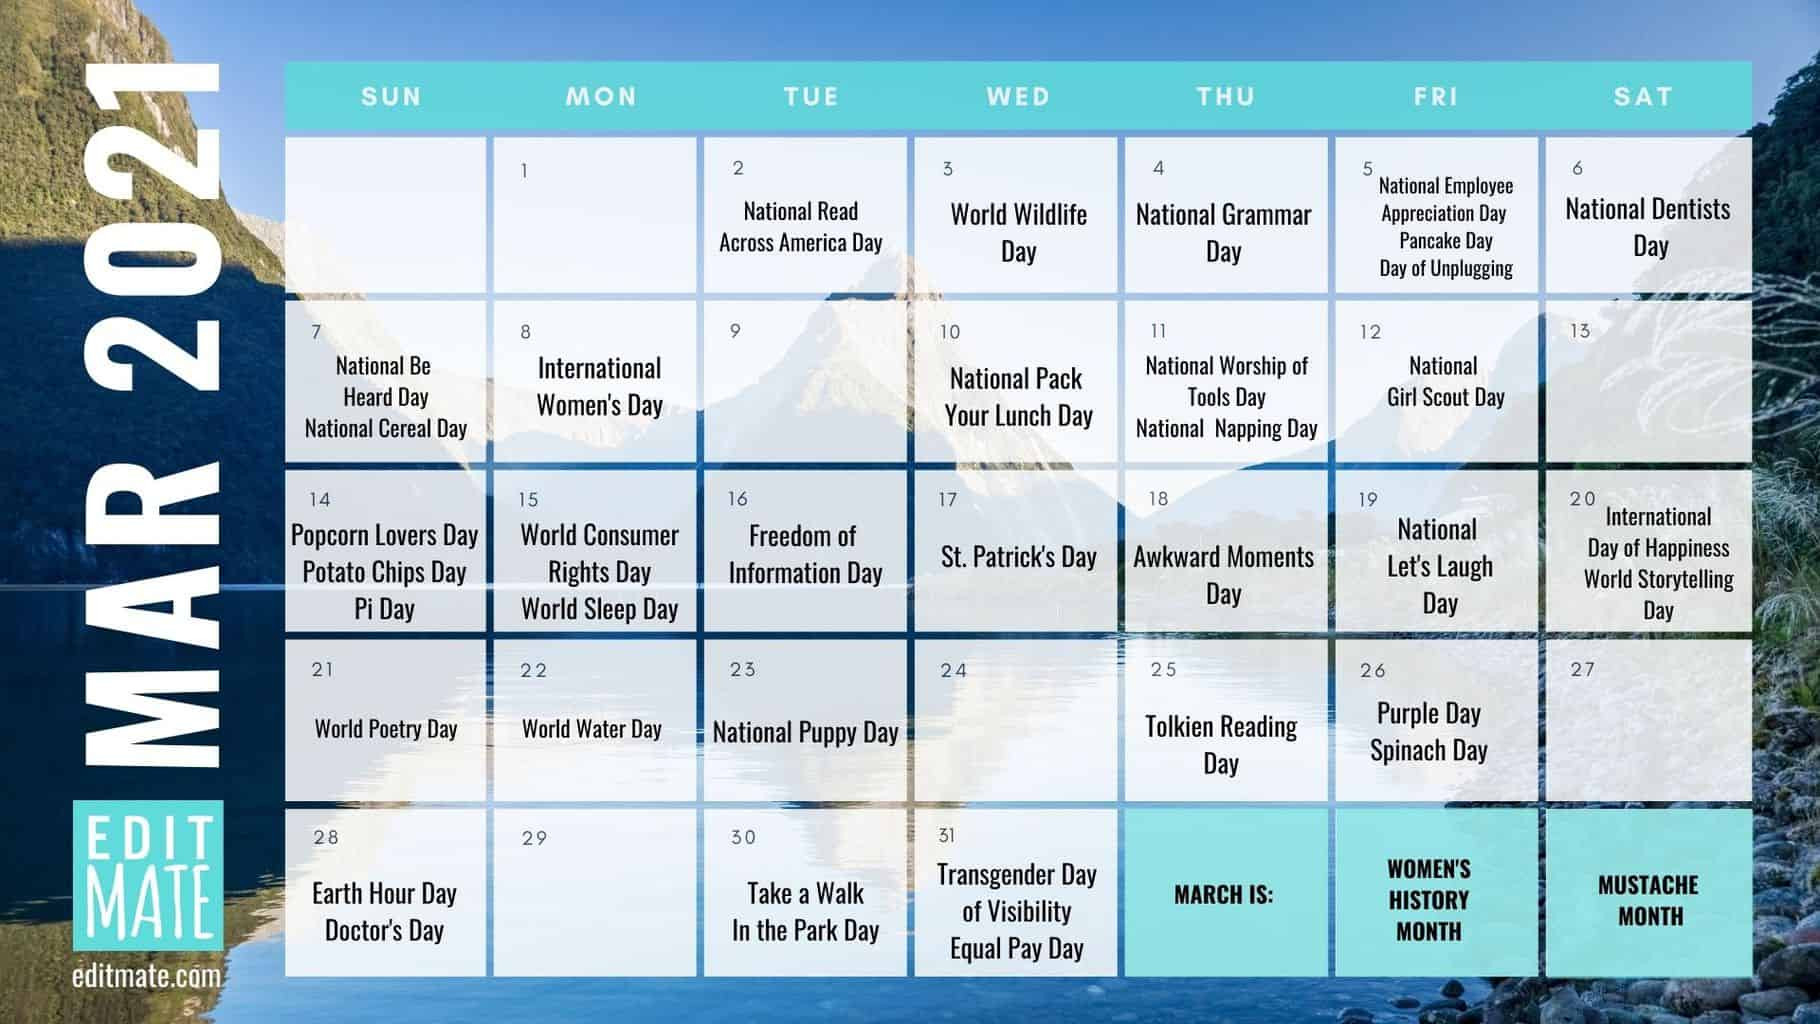 2021 Social Media Holiday Calendar   Editmate-Printable List Of 2021 National Days